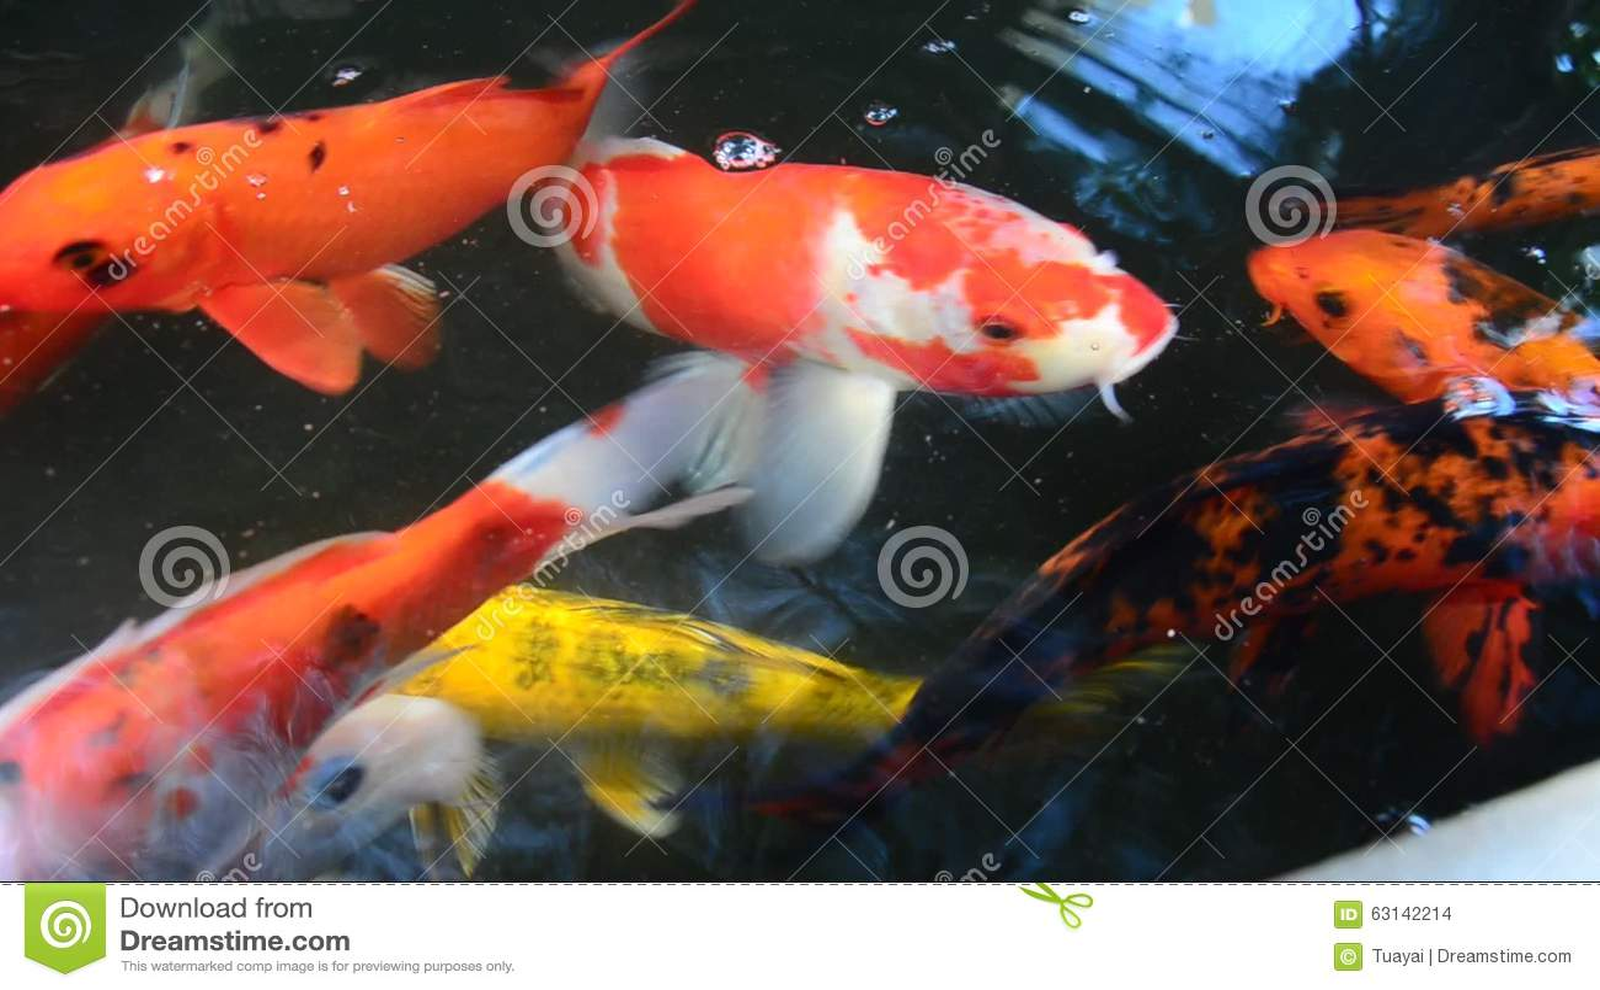 Karpers In Tuin : Buitensporige karper of koi vissen die bij vijver in de tuin